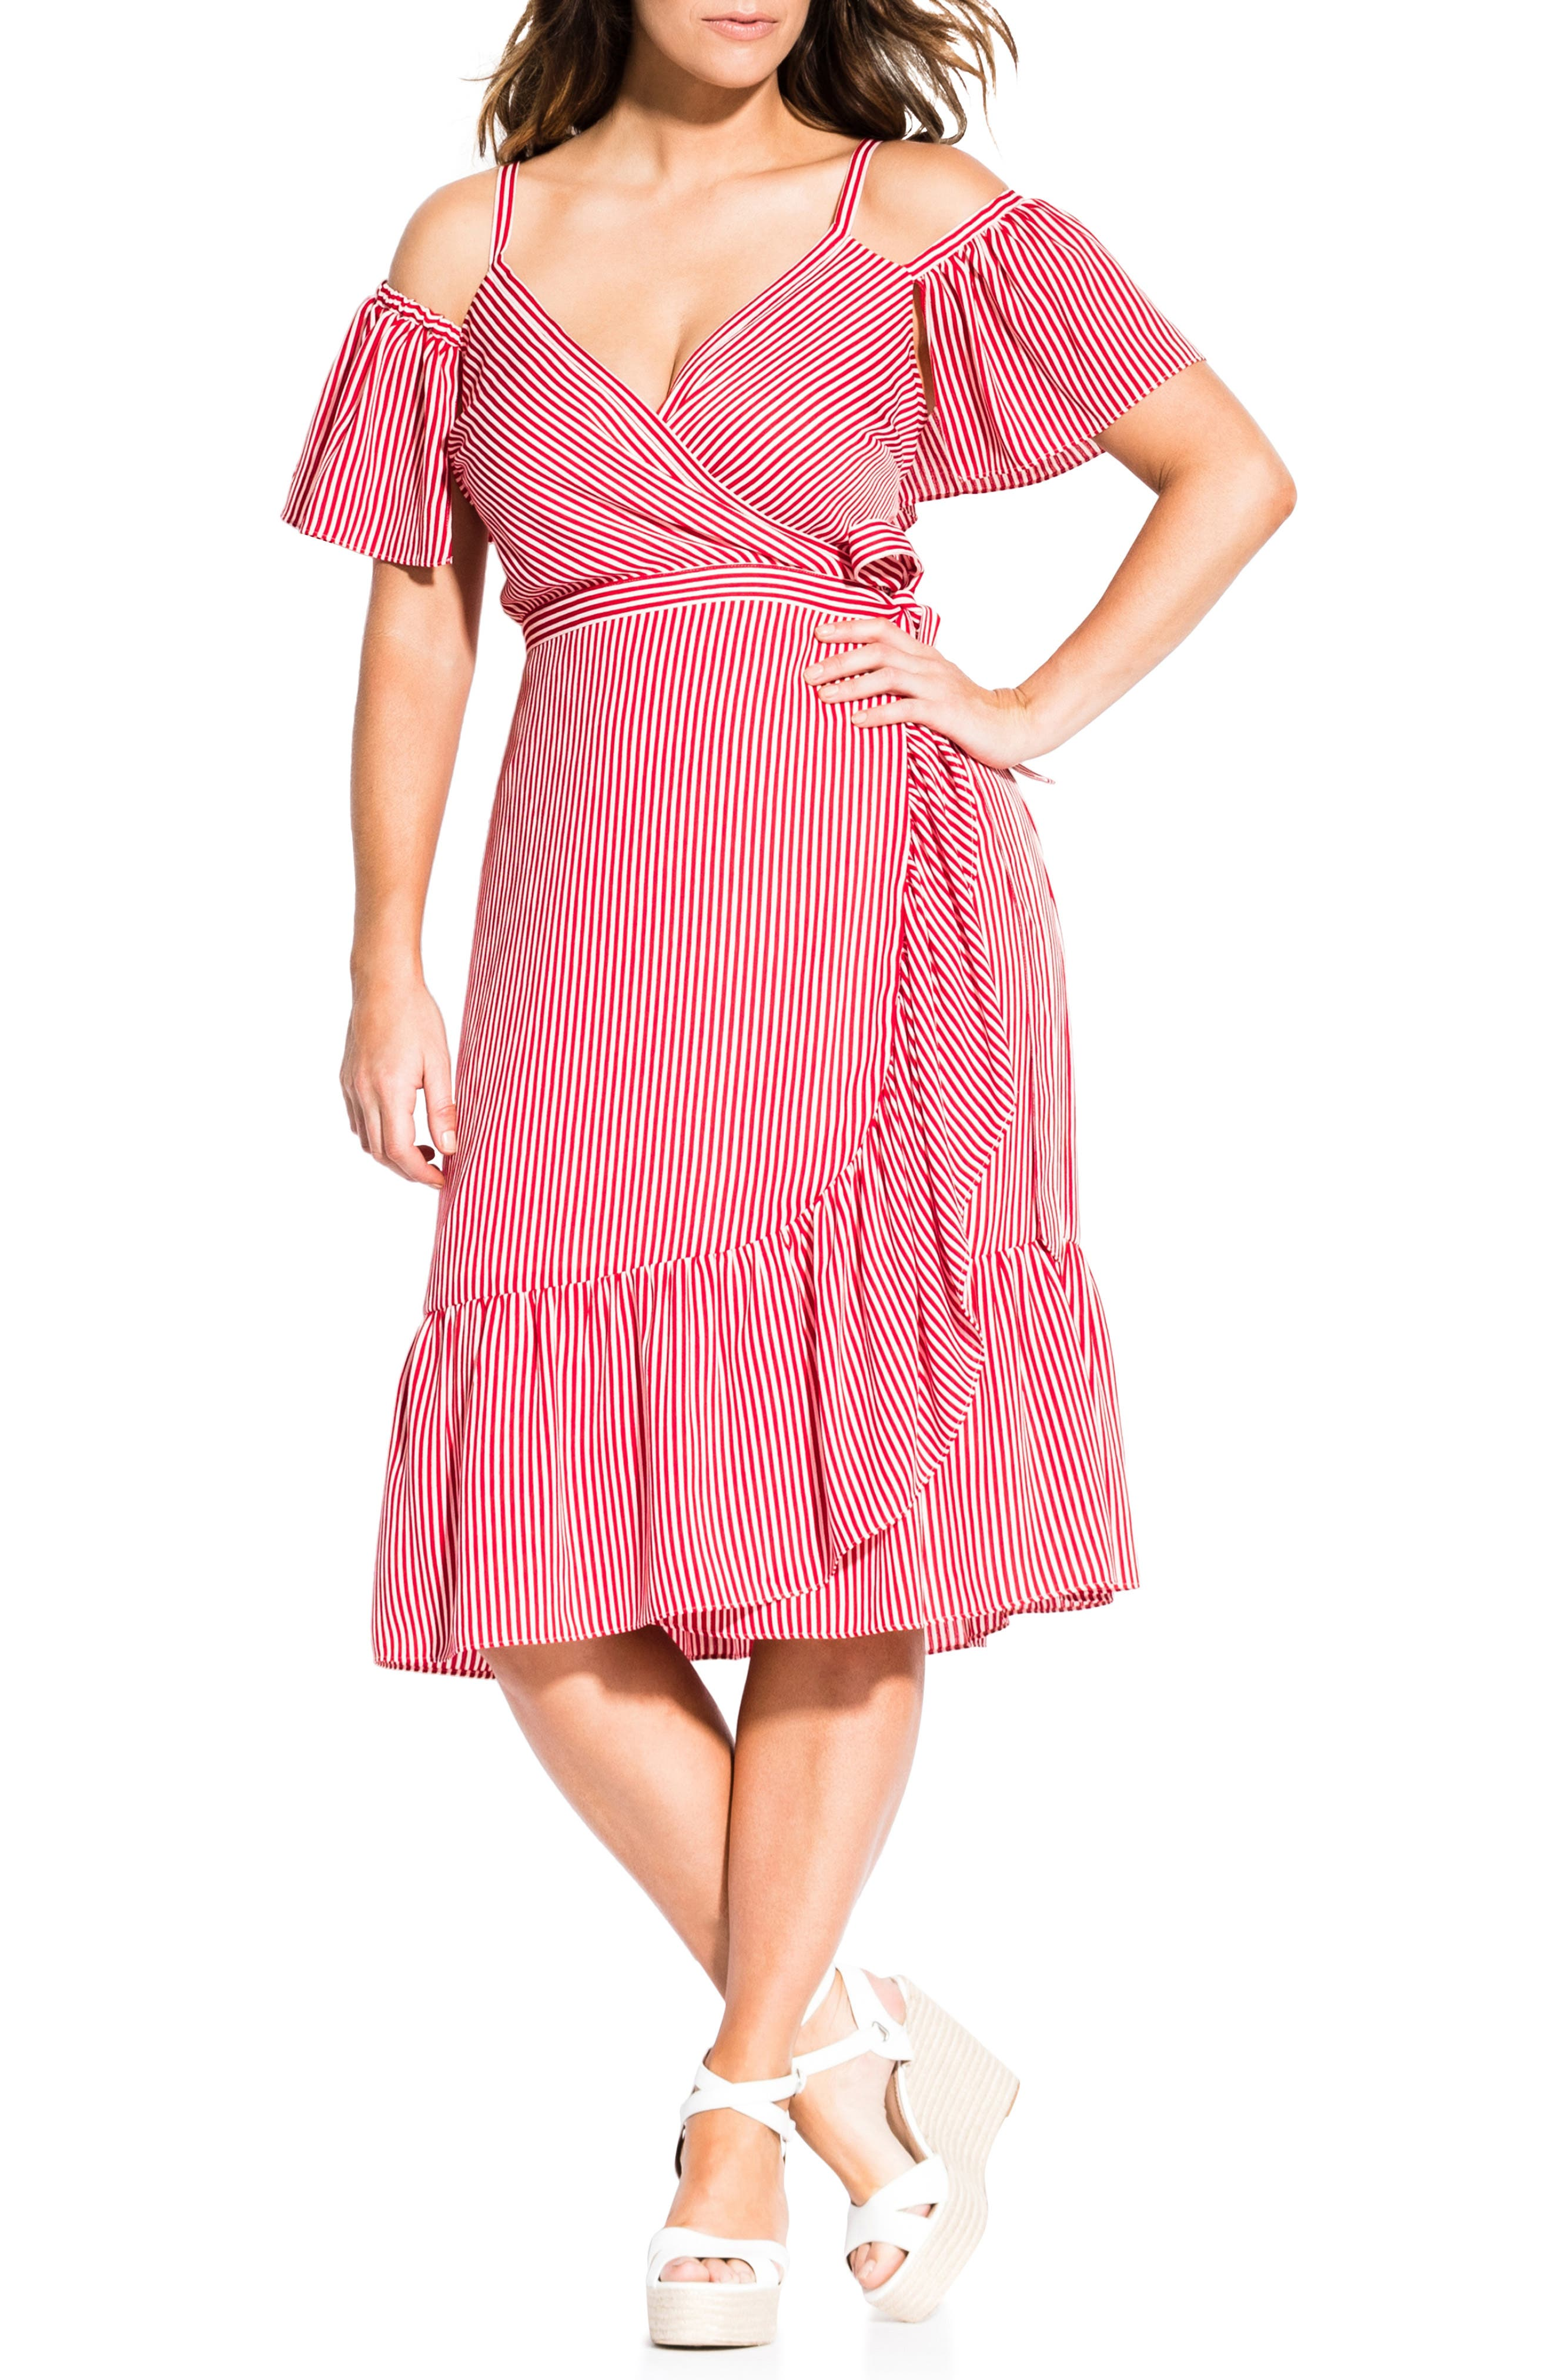 Plus Size City Chic Riviera Stripe Cold Shoulder Wrap Dress, Pink